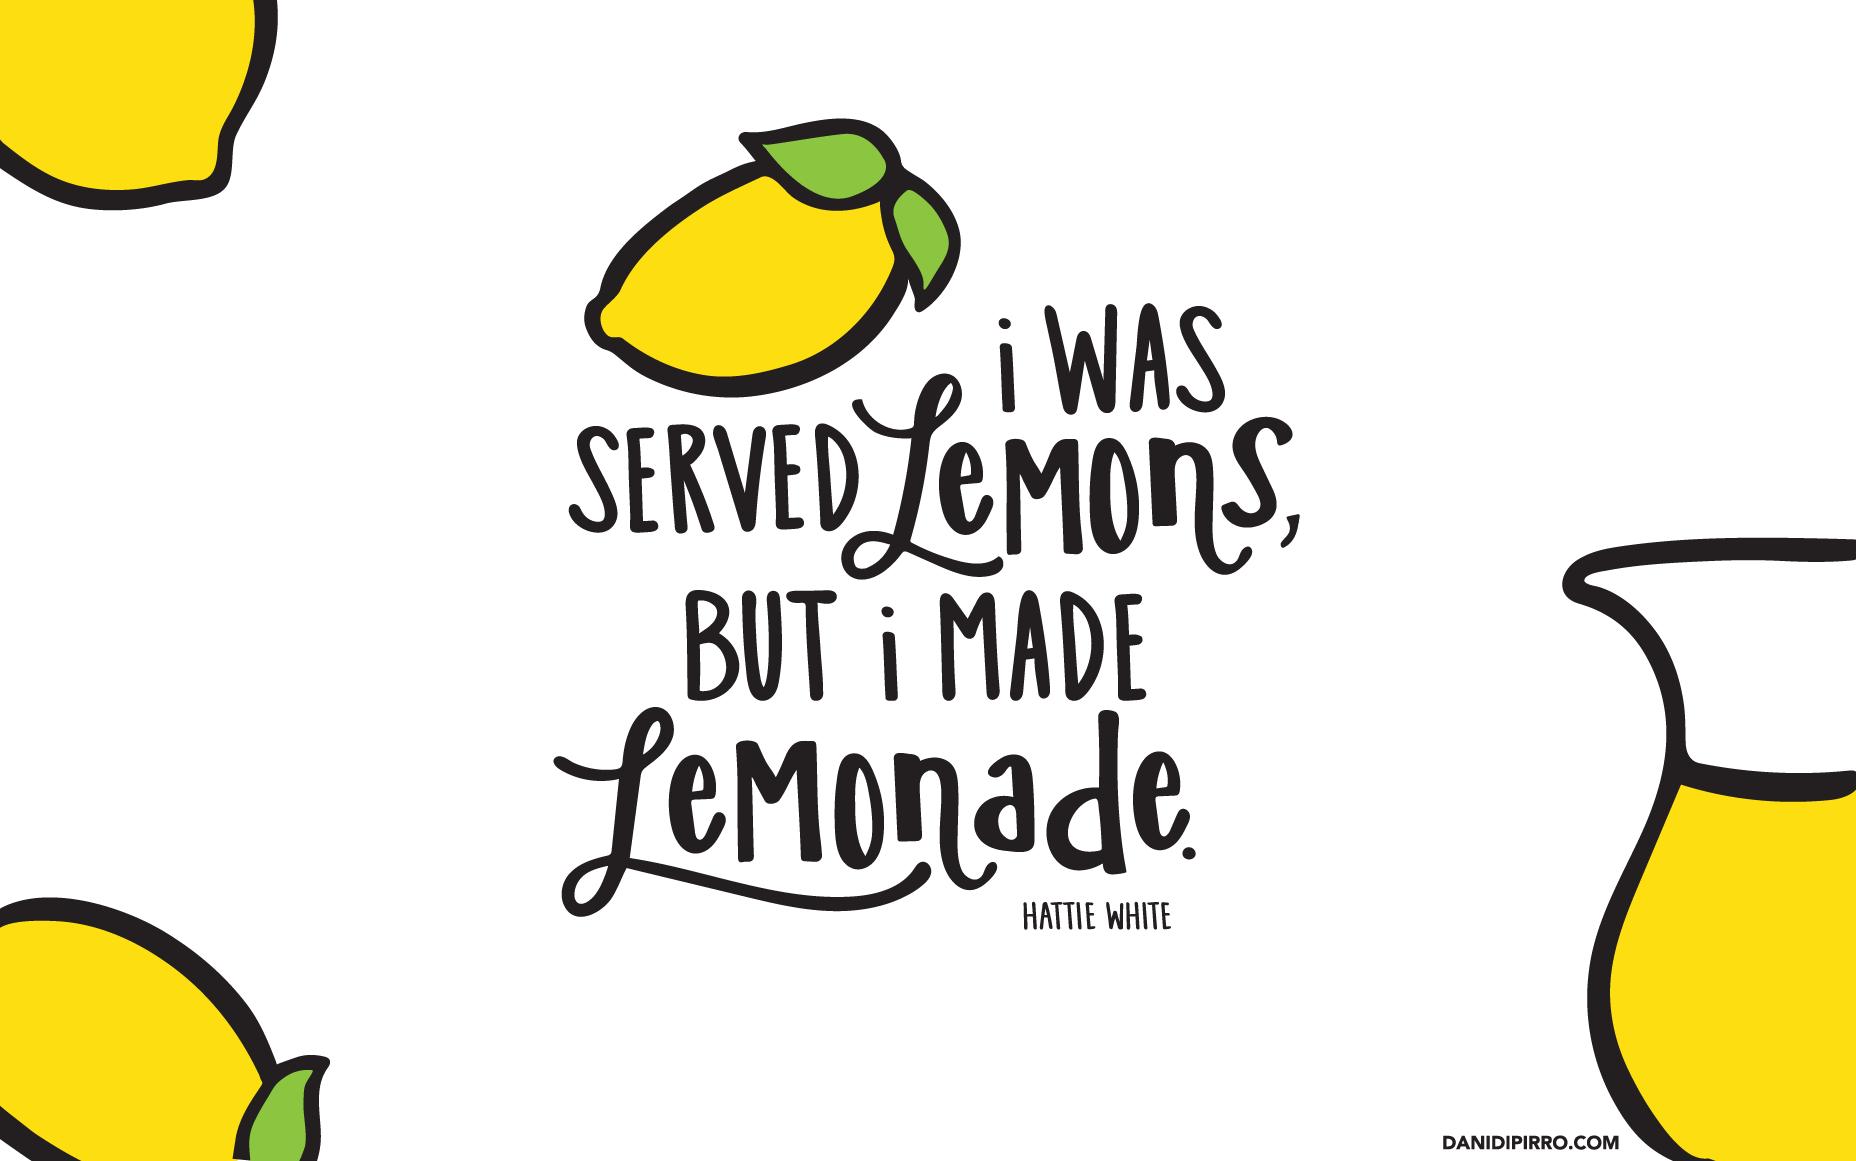 Free desktop background designed. Lemonade clipart yellow colour object